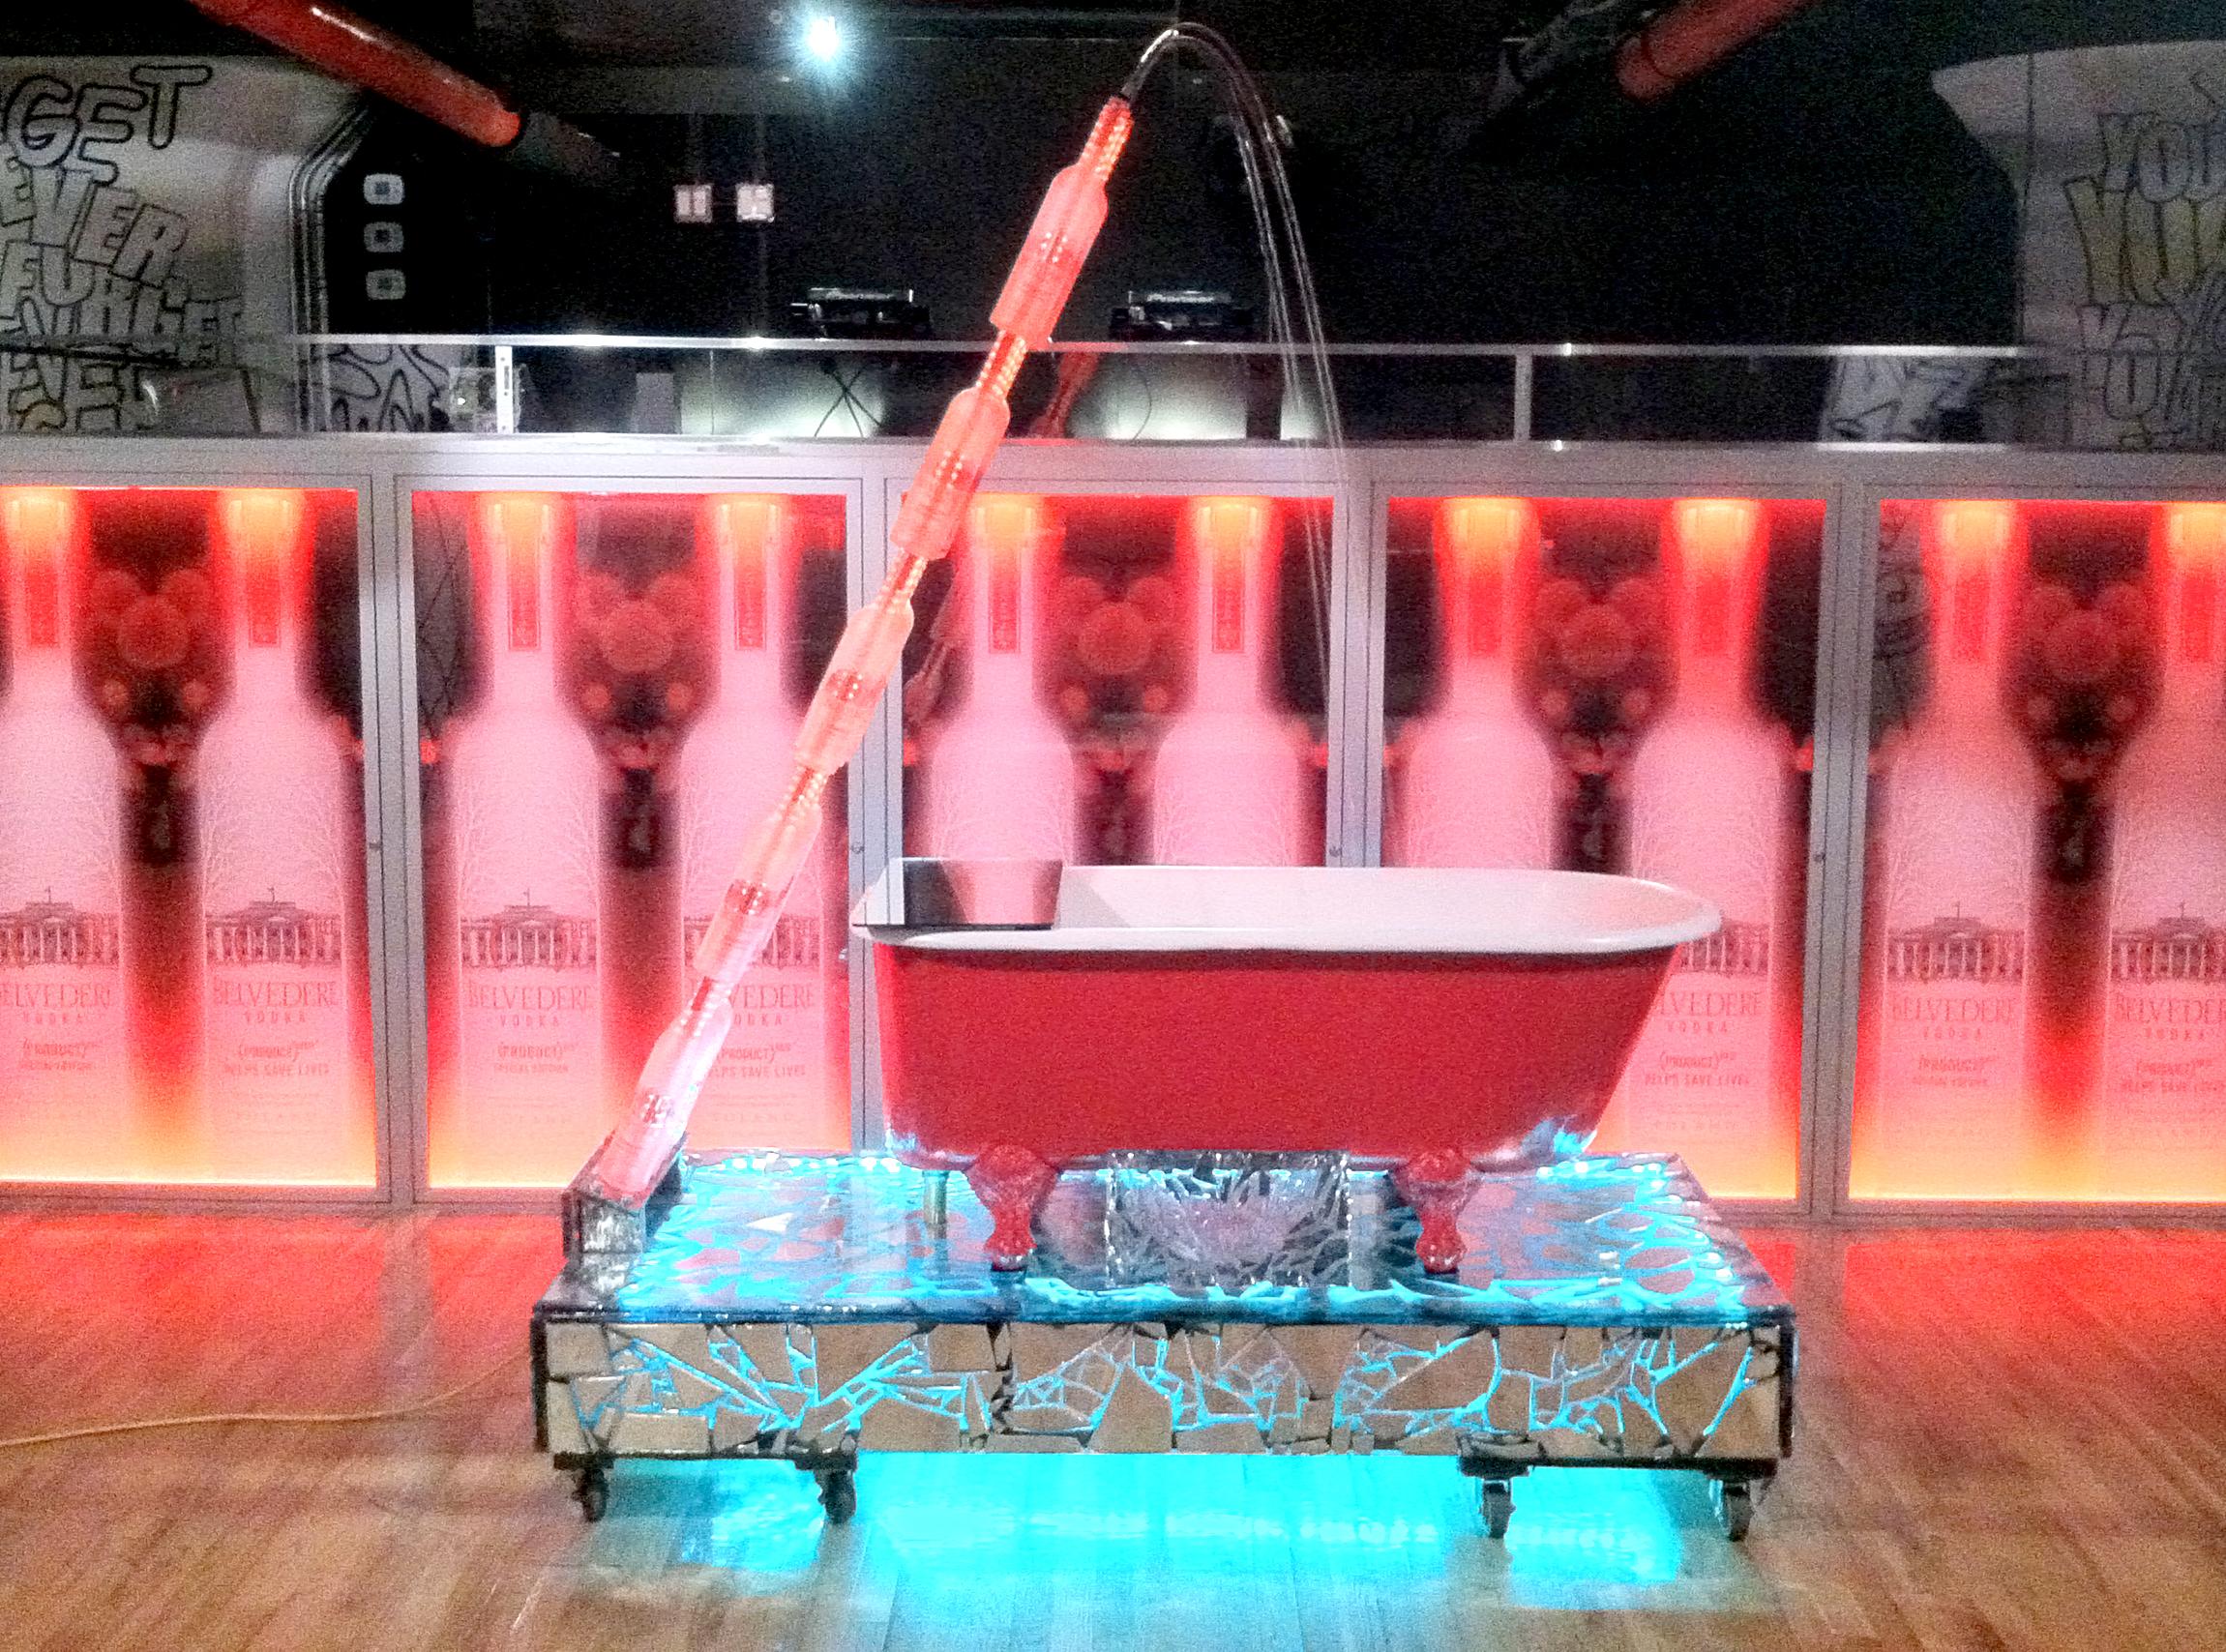 Front view of custom fabricated bathtub art installation for WIP nightclub.